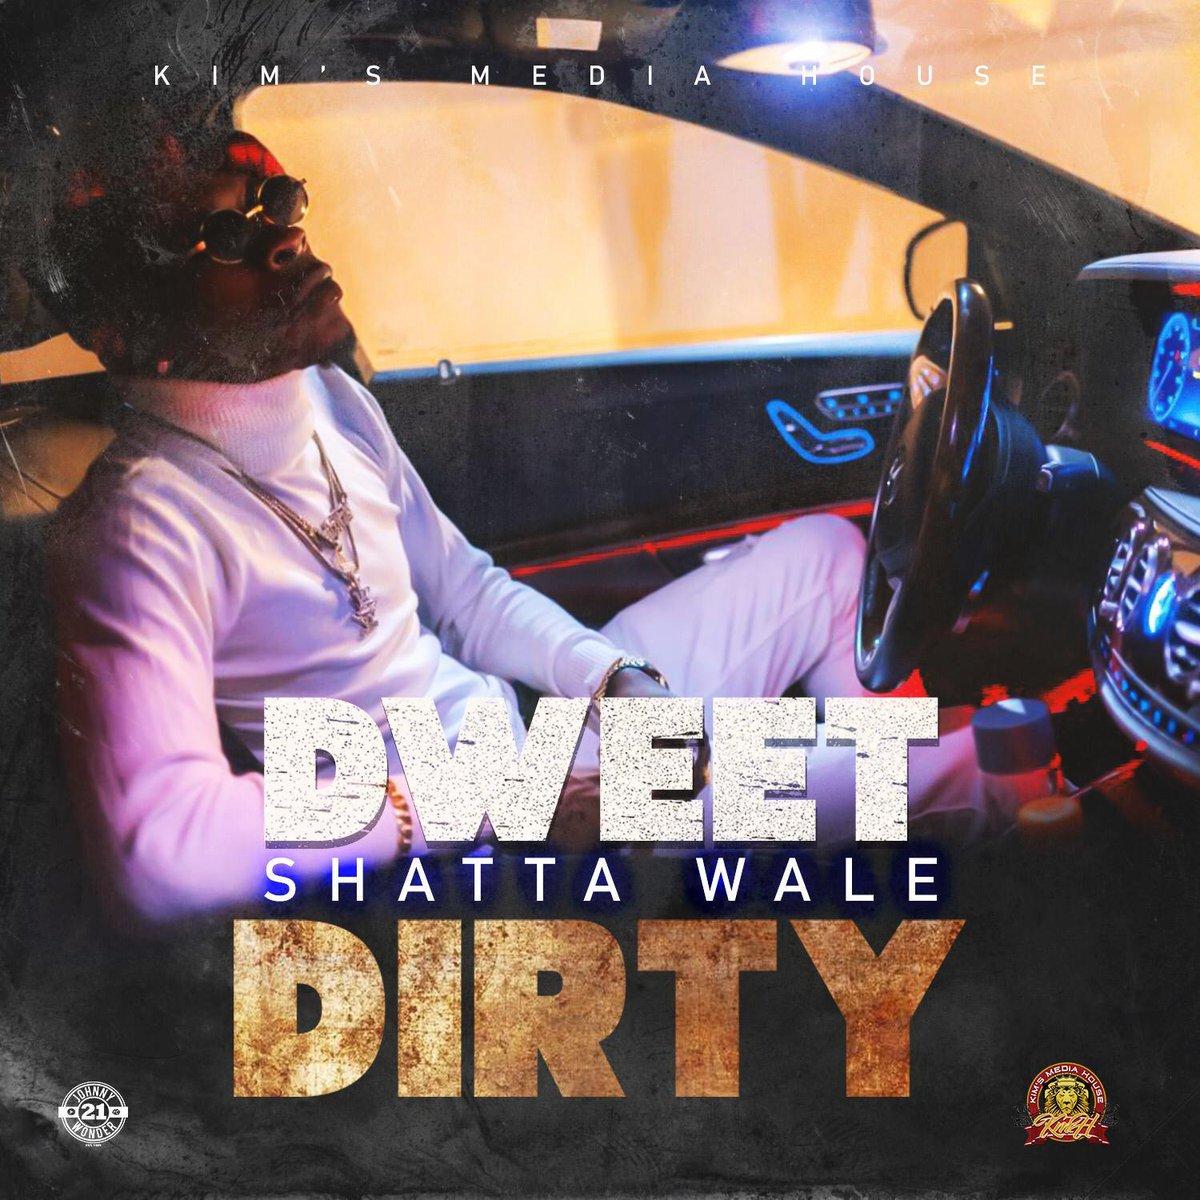 SHATTA WALE - DWEET DIRTY Produced By : Kim's Media House @shattawalegh @ZackAriyahProdpic.twitter.com/MblGwvoXB9